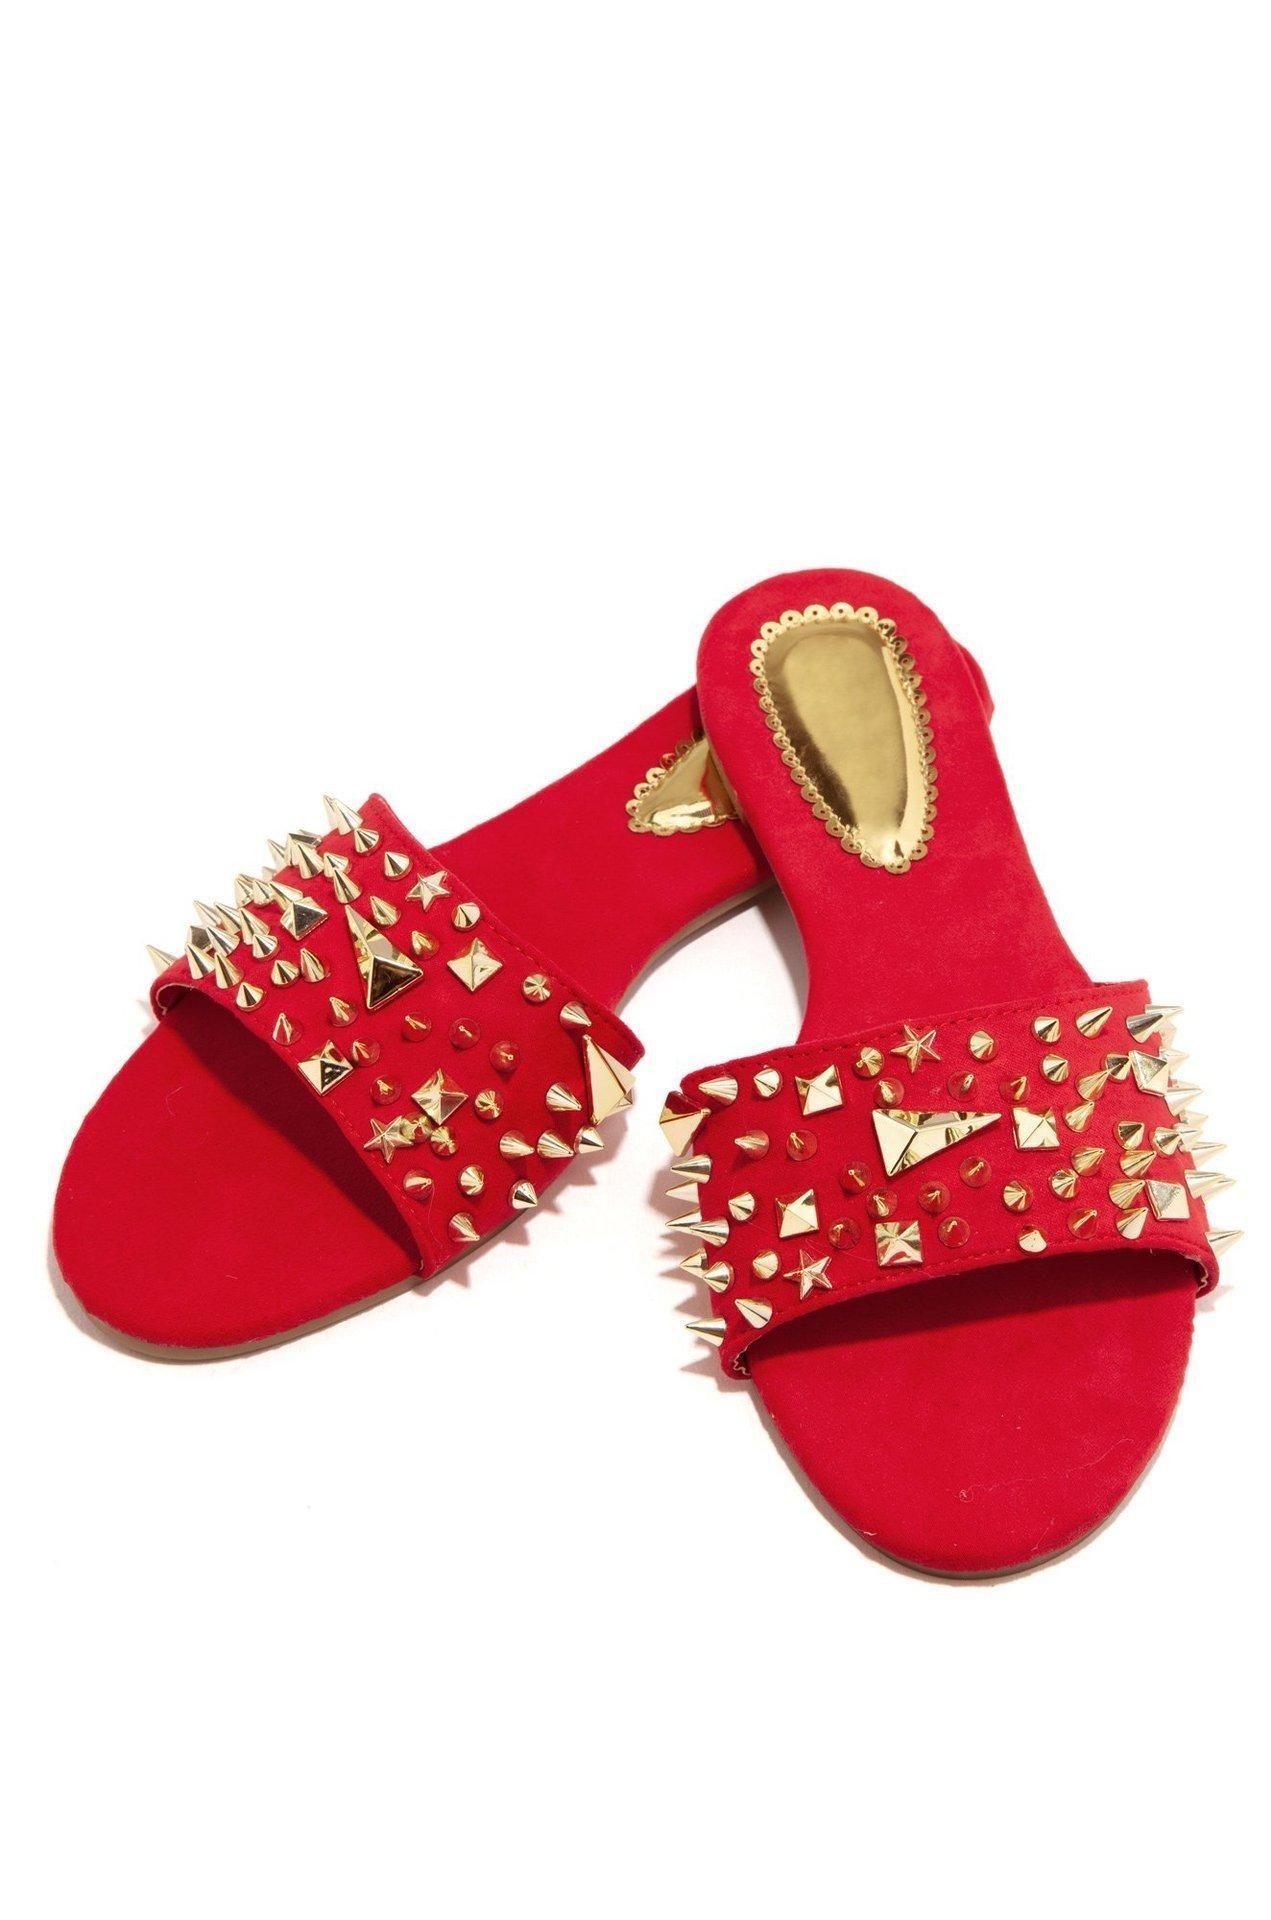 Hot Sale-Femmes Rivet Plage Slipper Stud Chaussons en cuir antidérapante Spikes Souliers simples Flip Flop 36-42